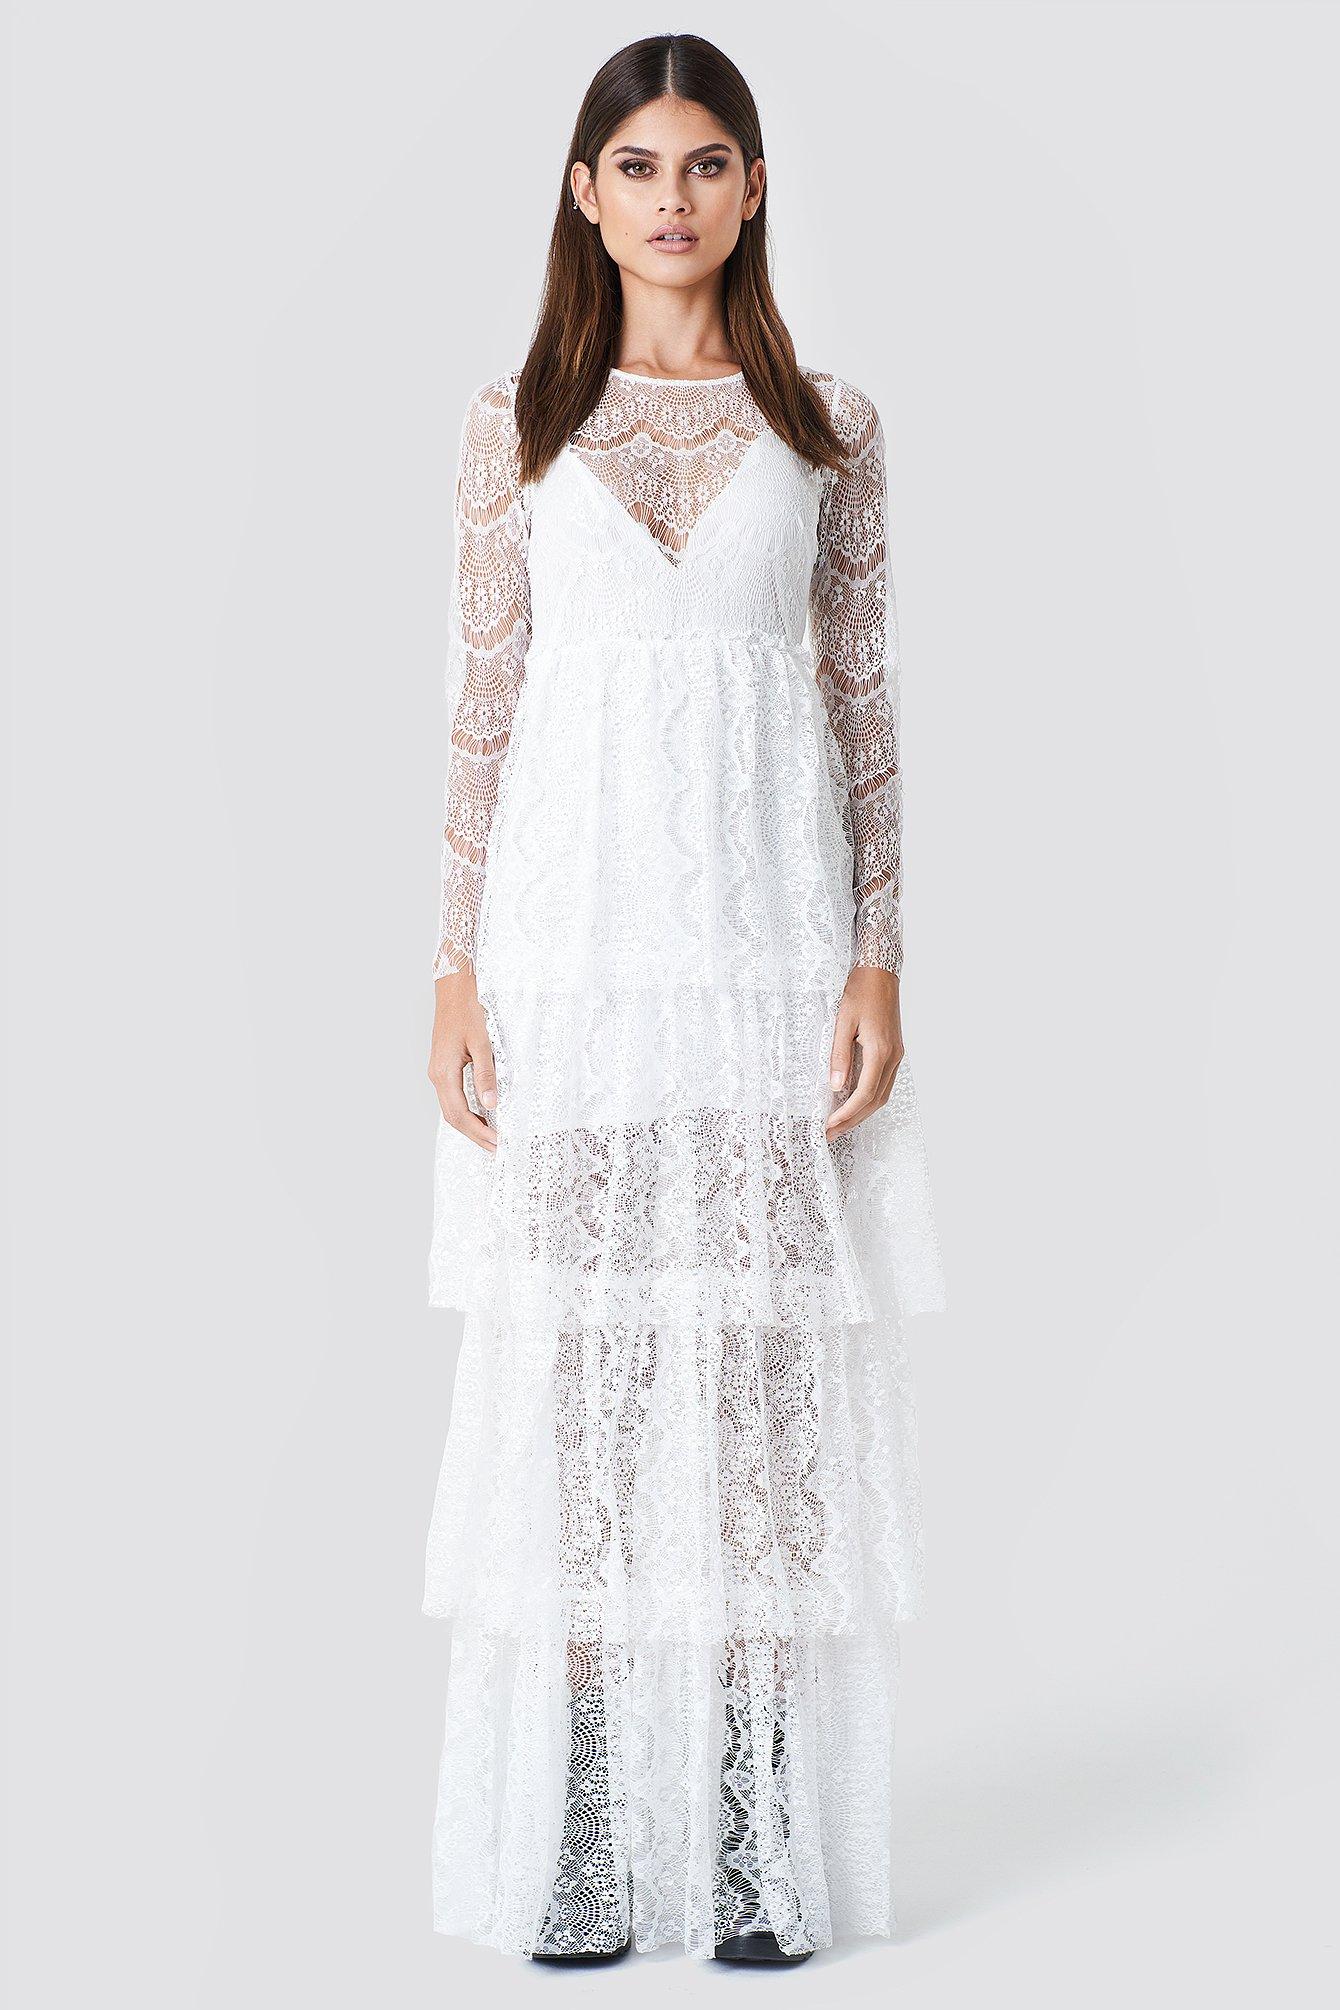 LONG SLEEVE LACE DRESS - WHITE